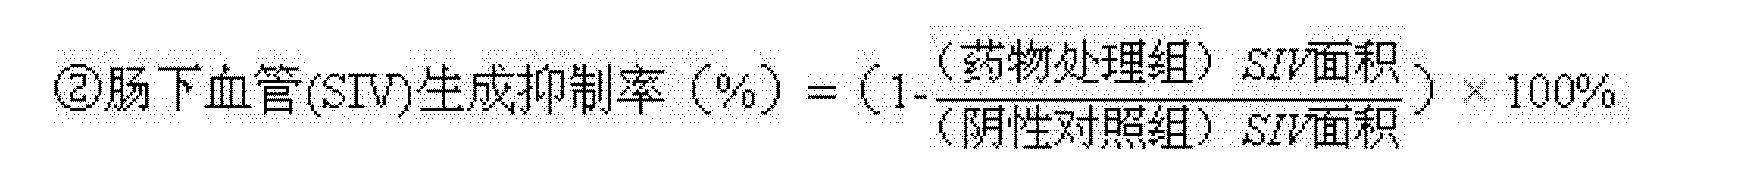 Figure CN103054866AD00092